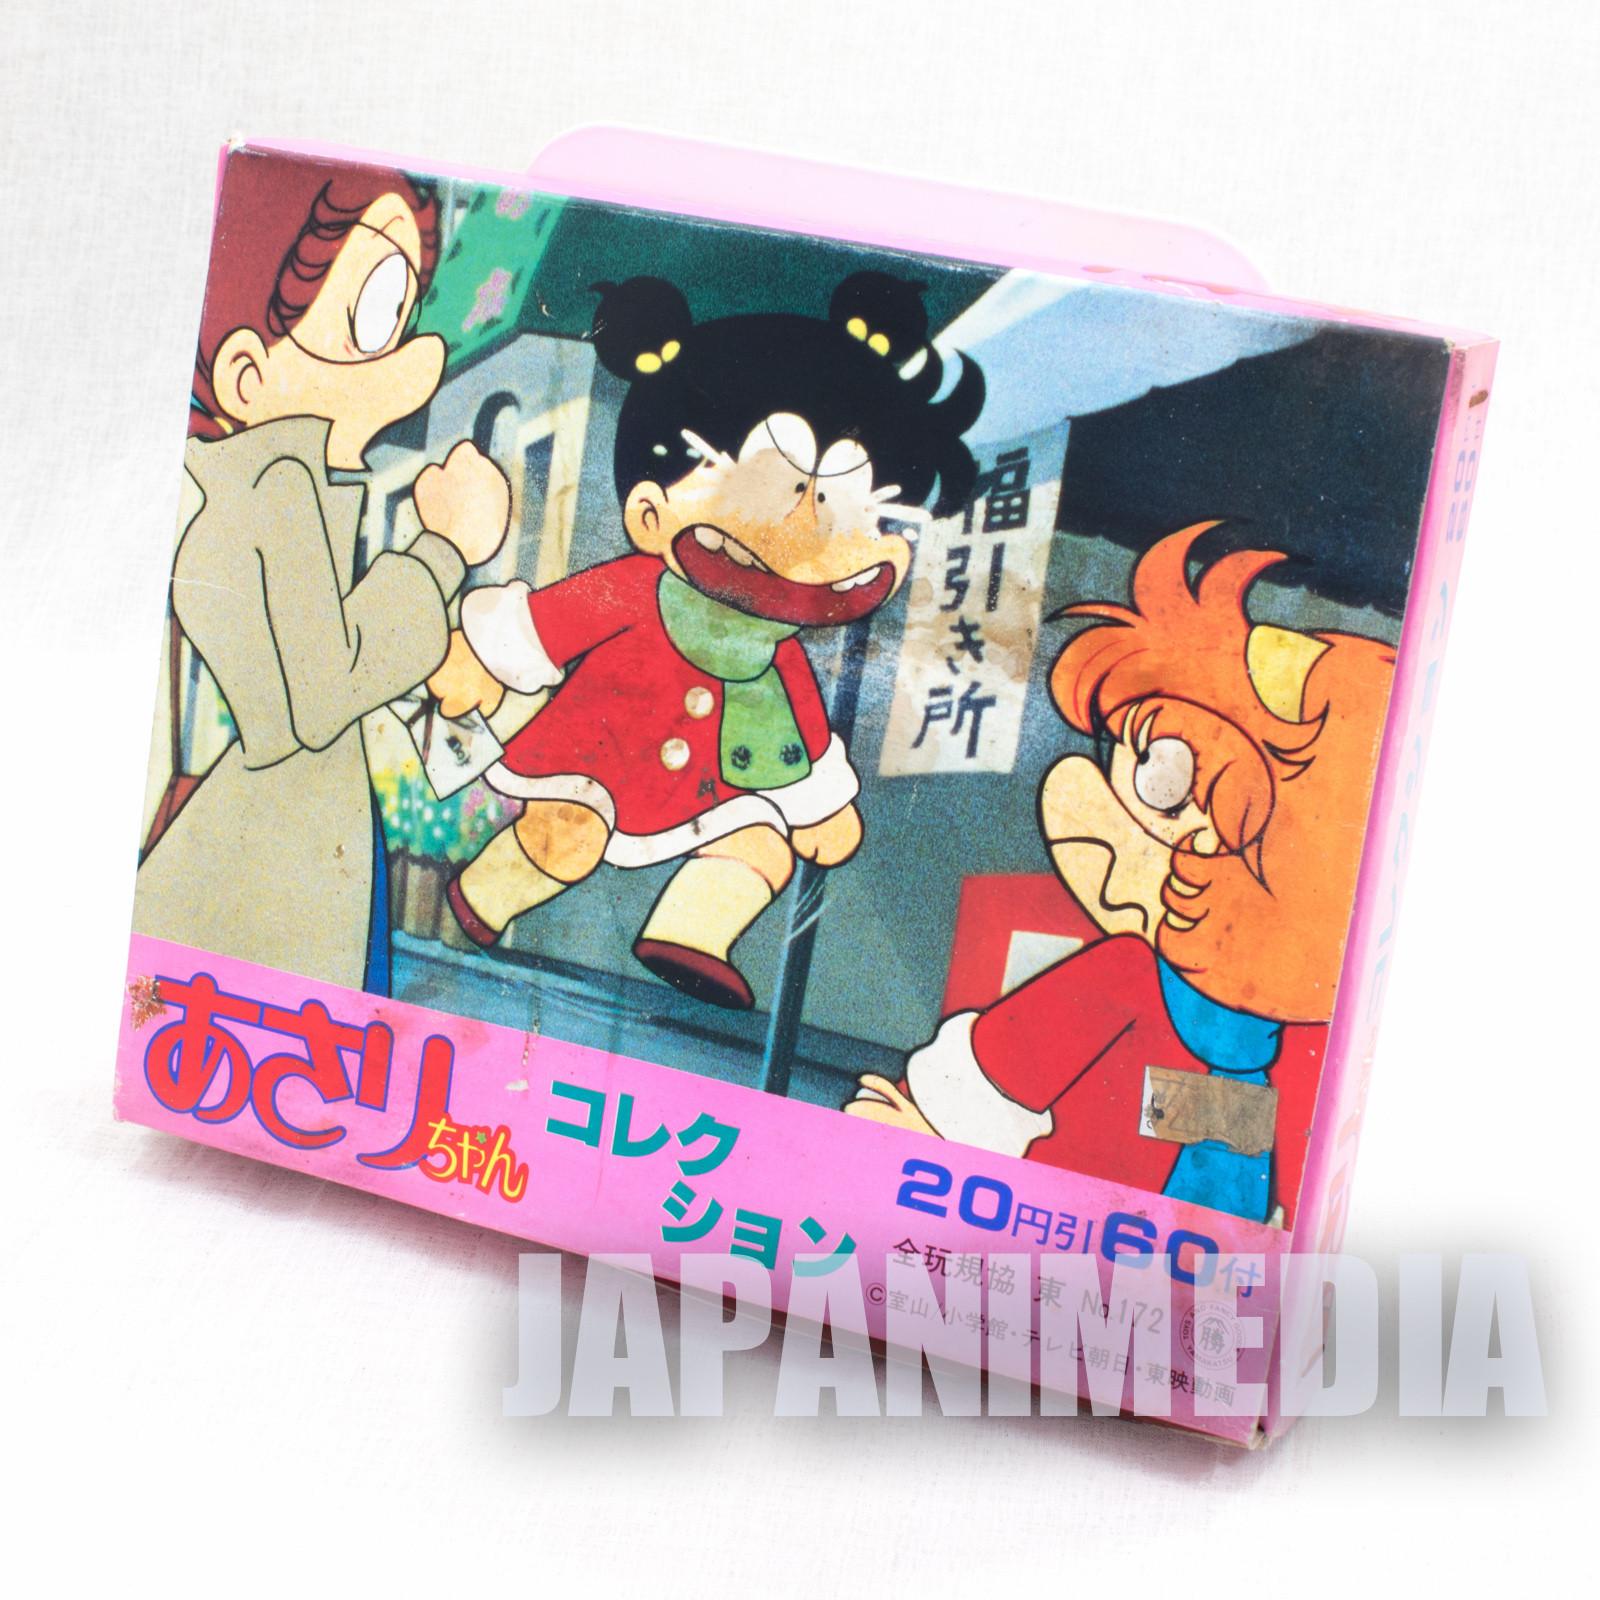 Retro RARE Asari chan Sticker 60pc & Notebook Set 3pc JAPAN ANIME